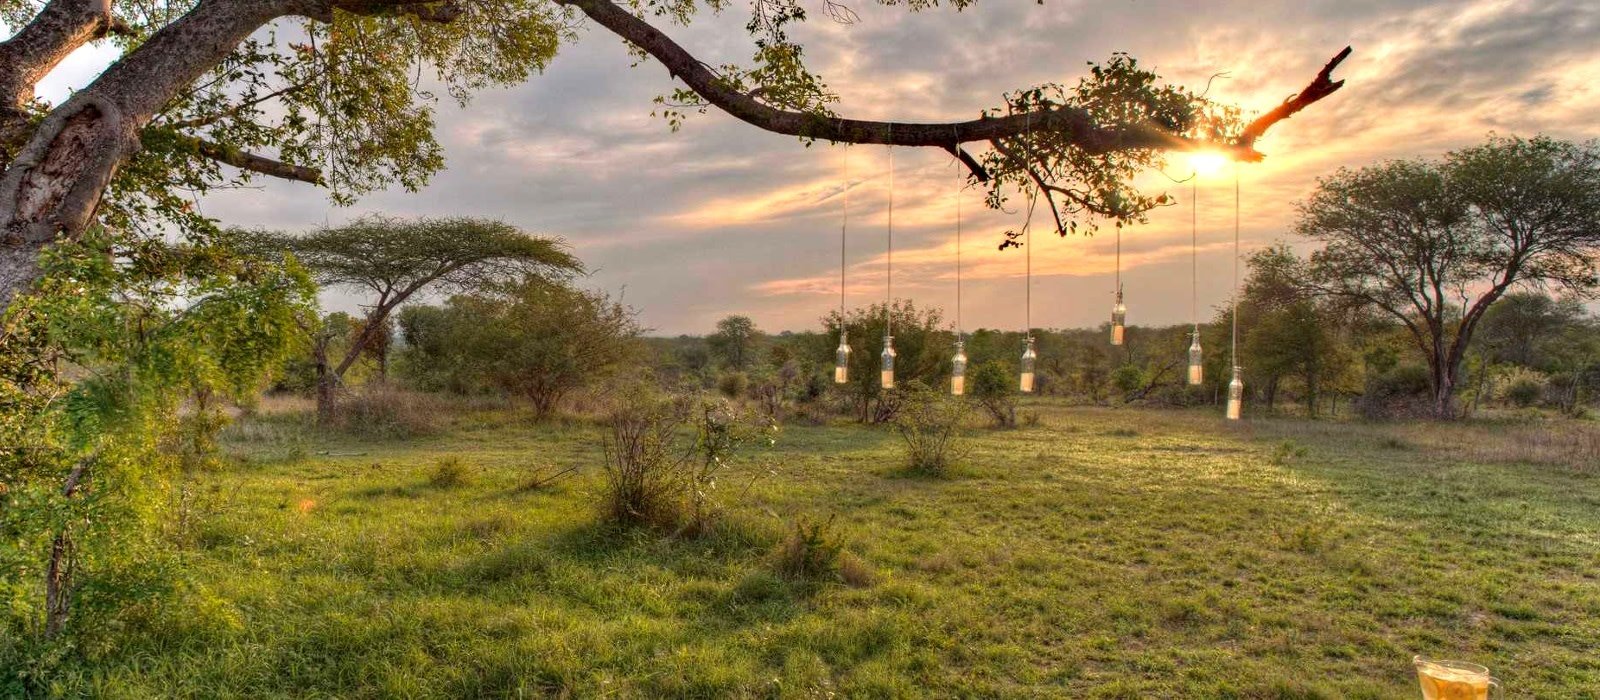 Hotel Kirkman's Kamp South Africa